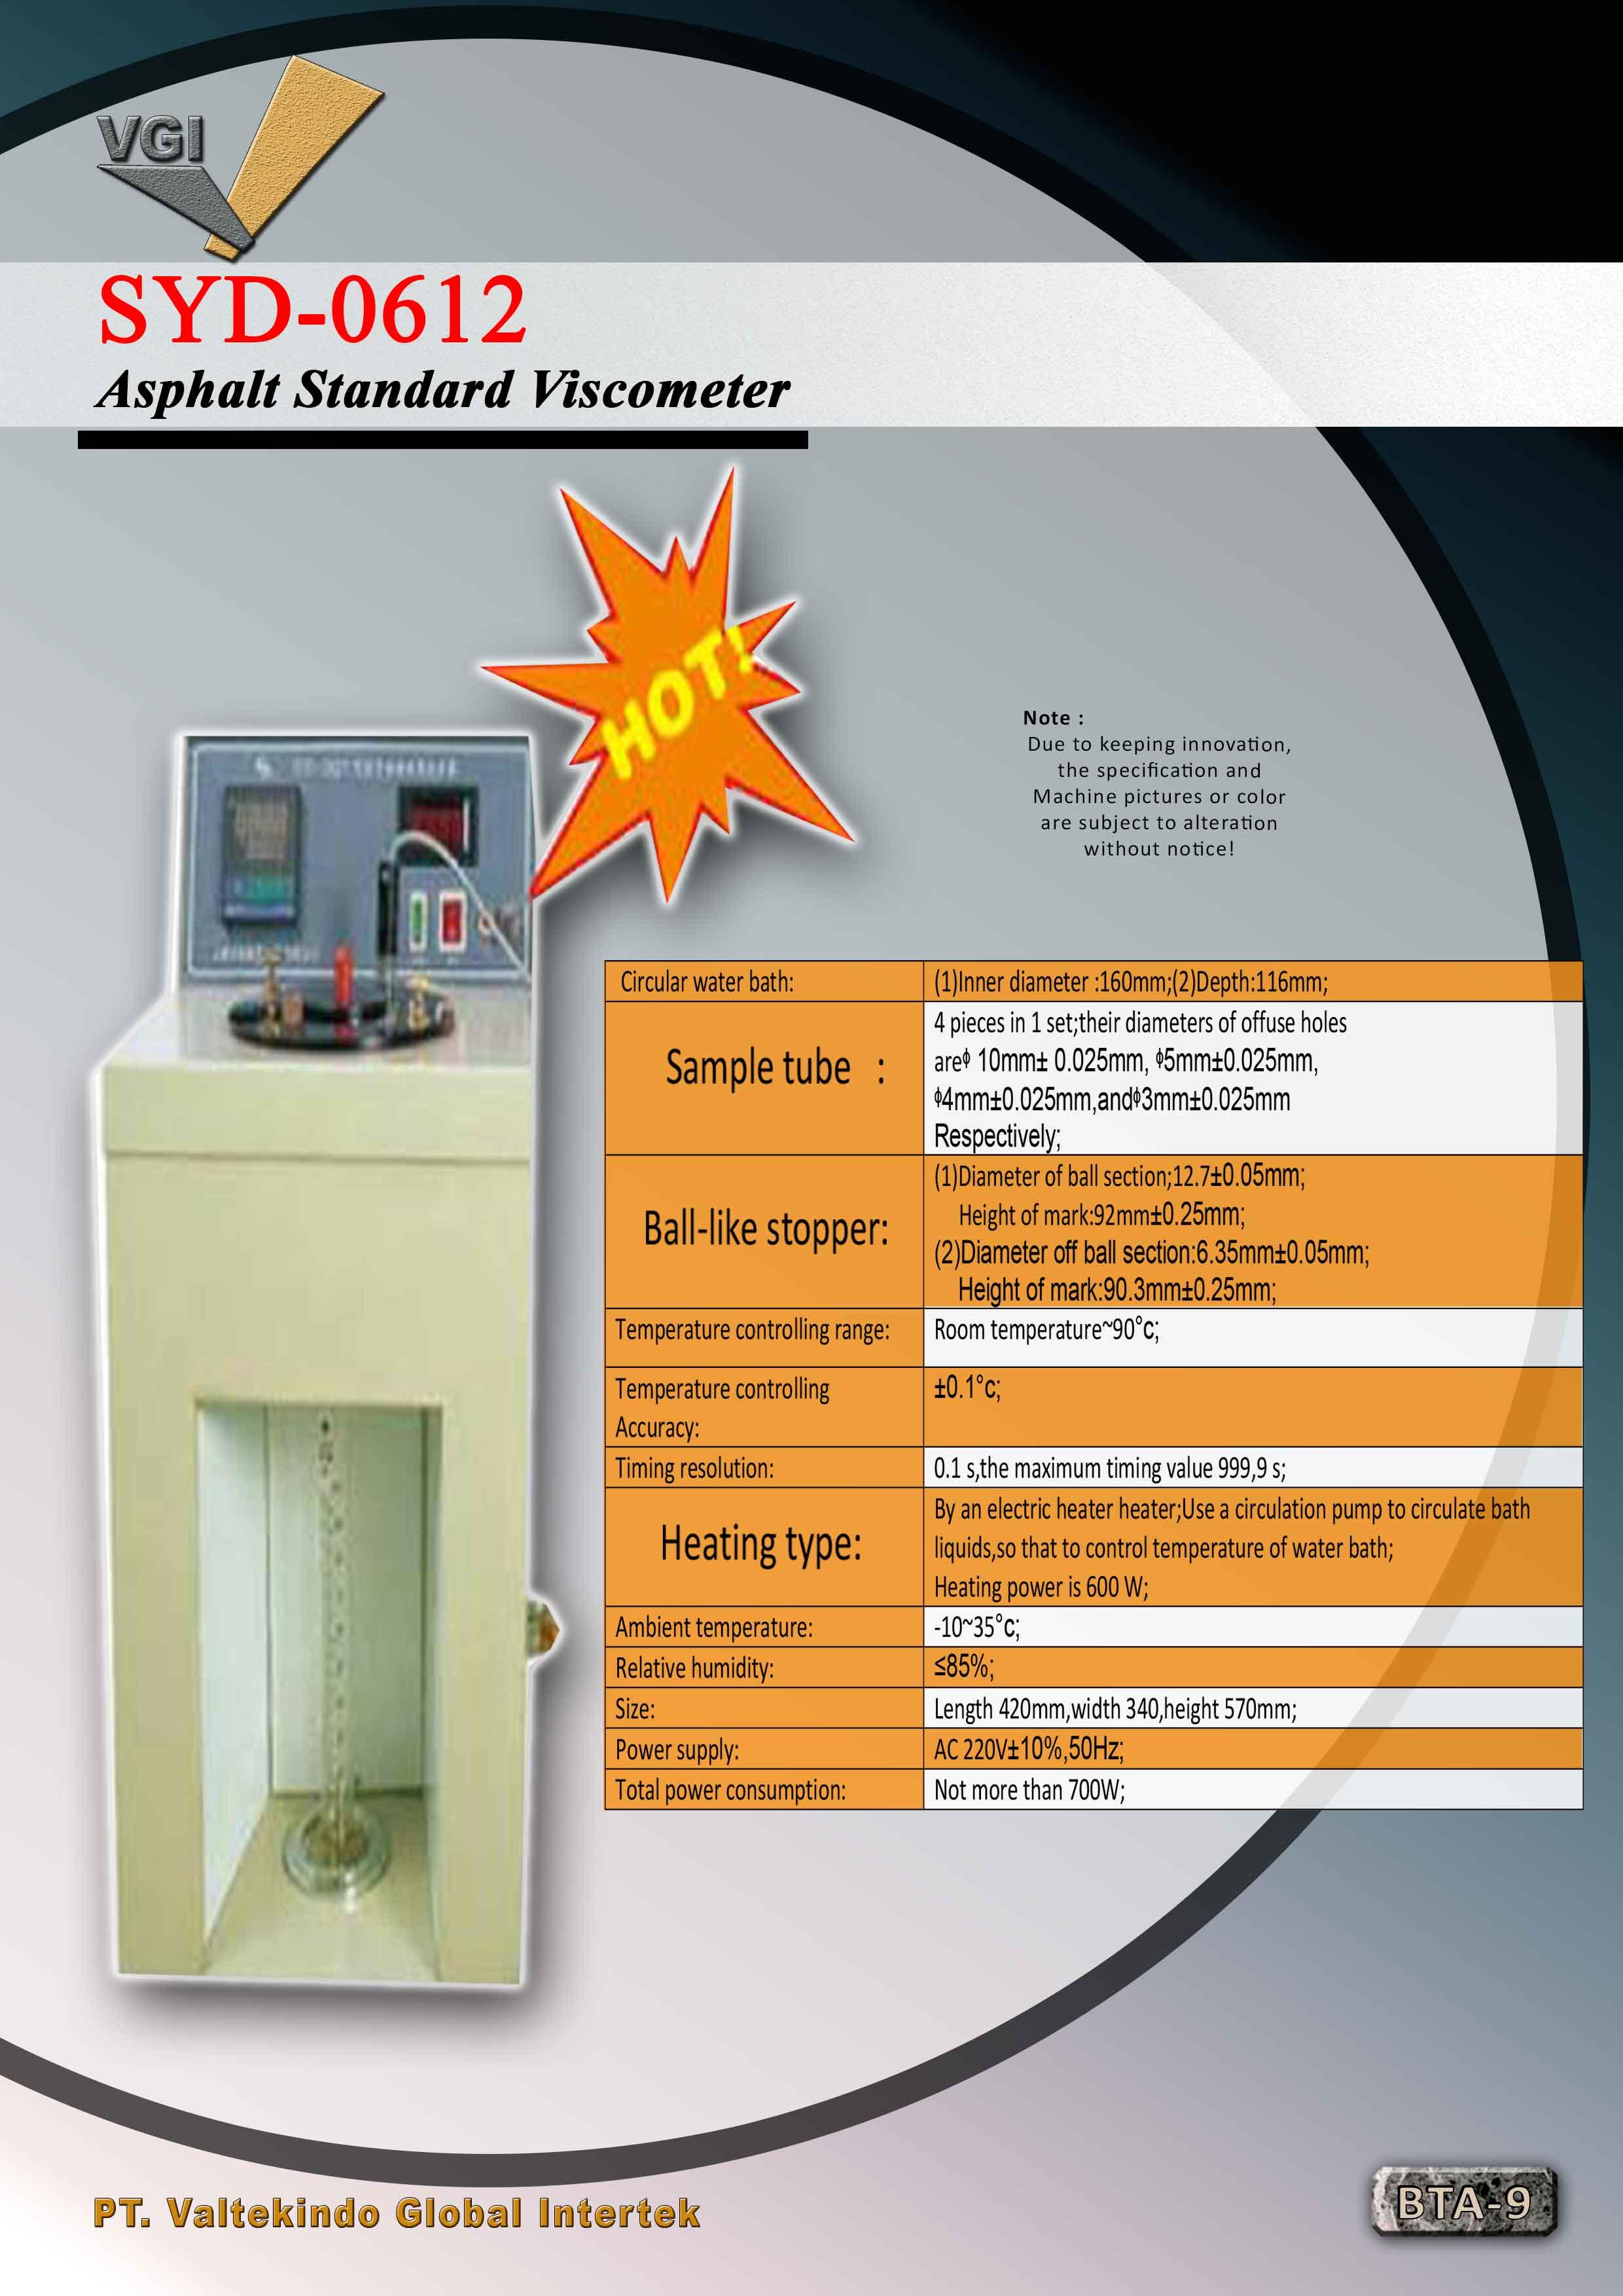 jual mesin Asphalt Standard Viscometer Asphalt Standard Viscometer